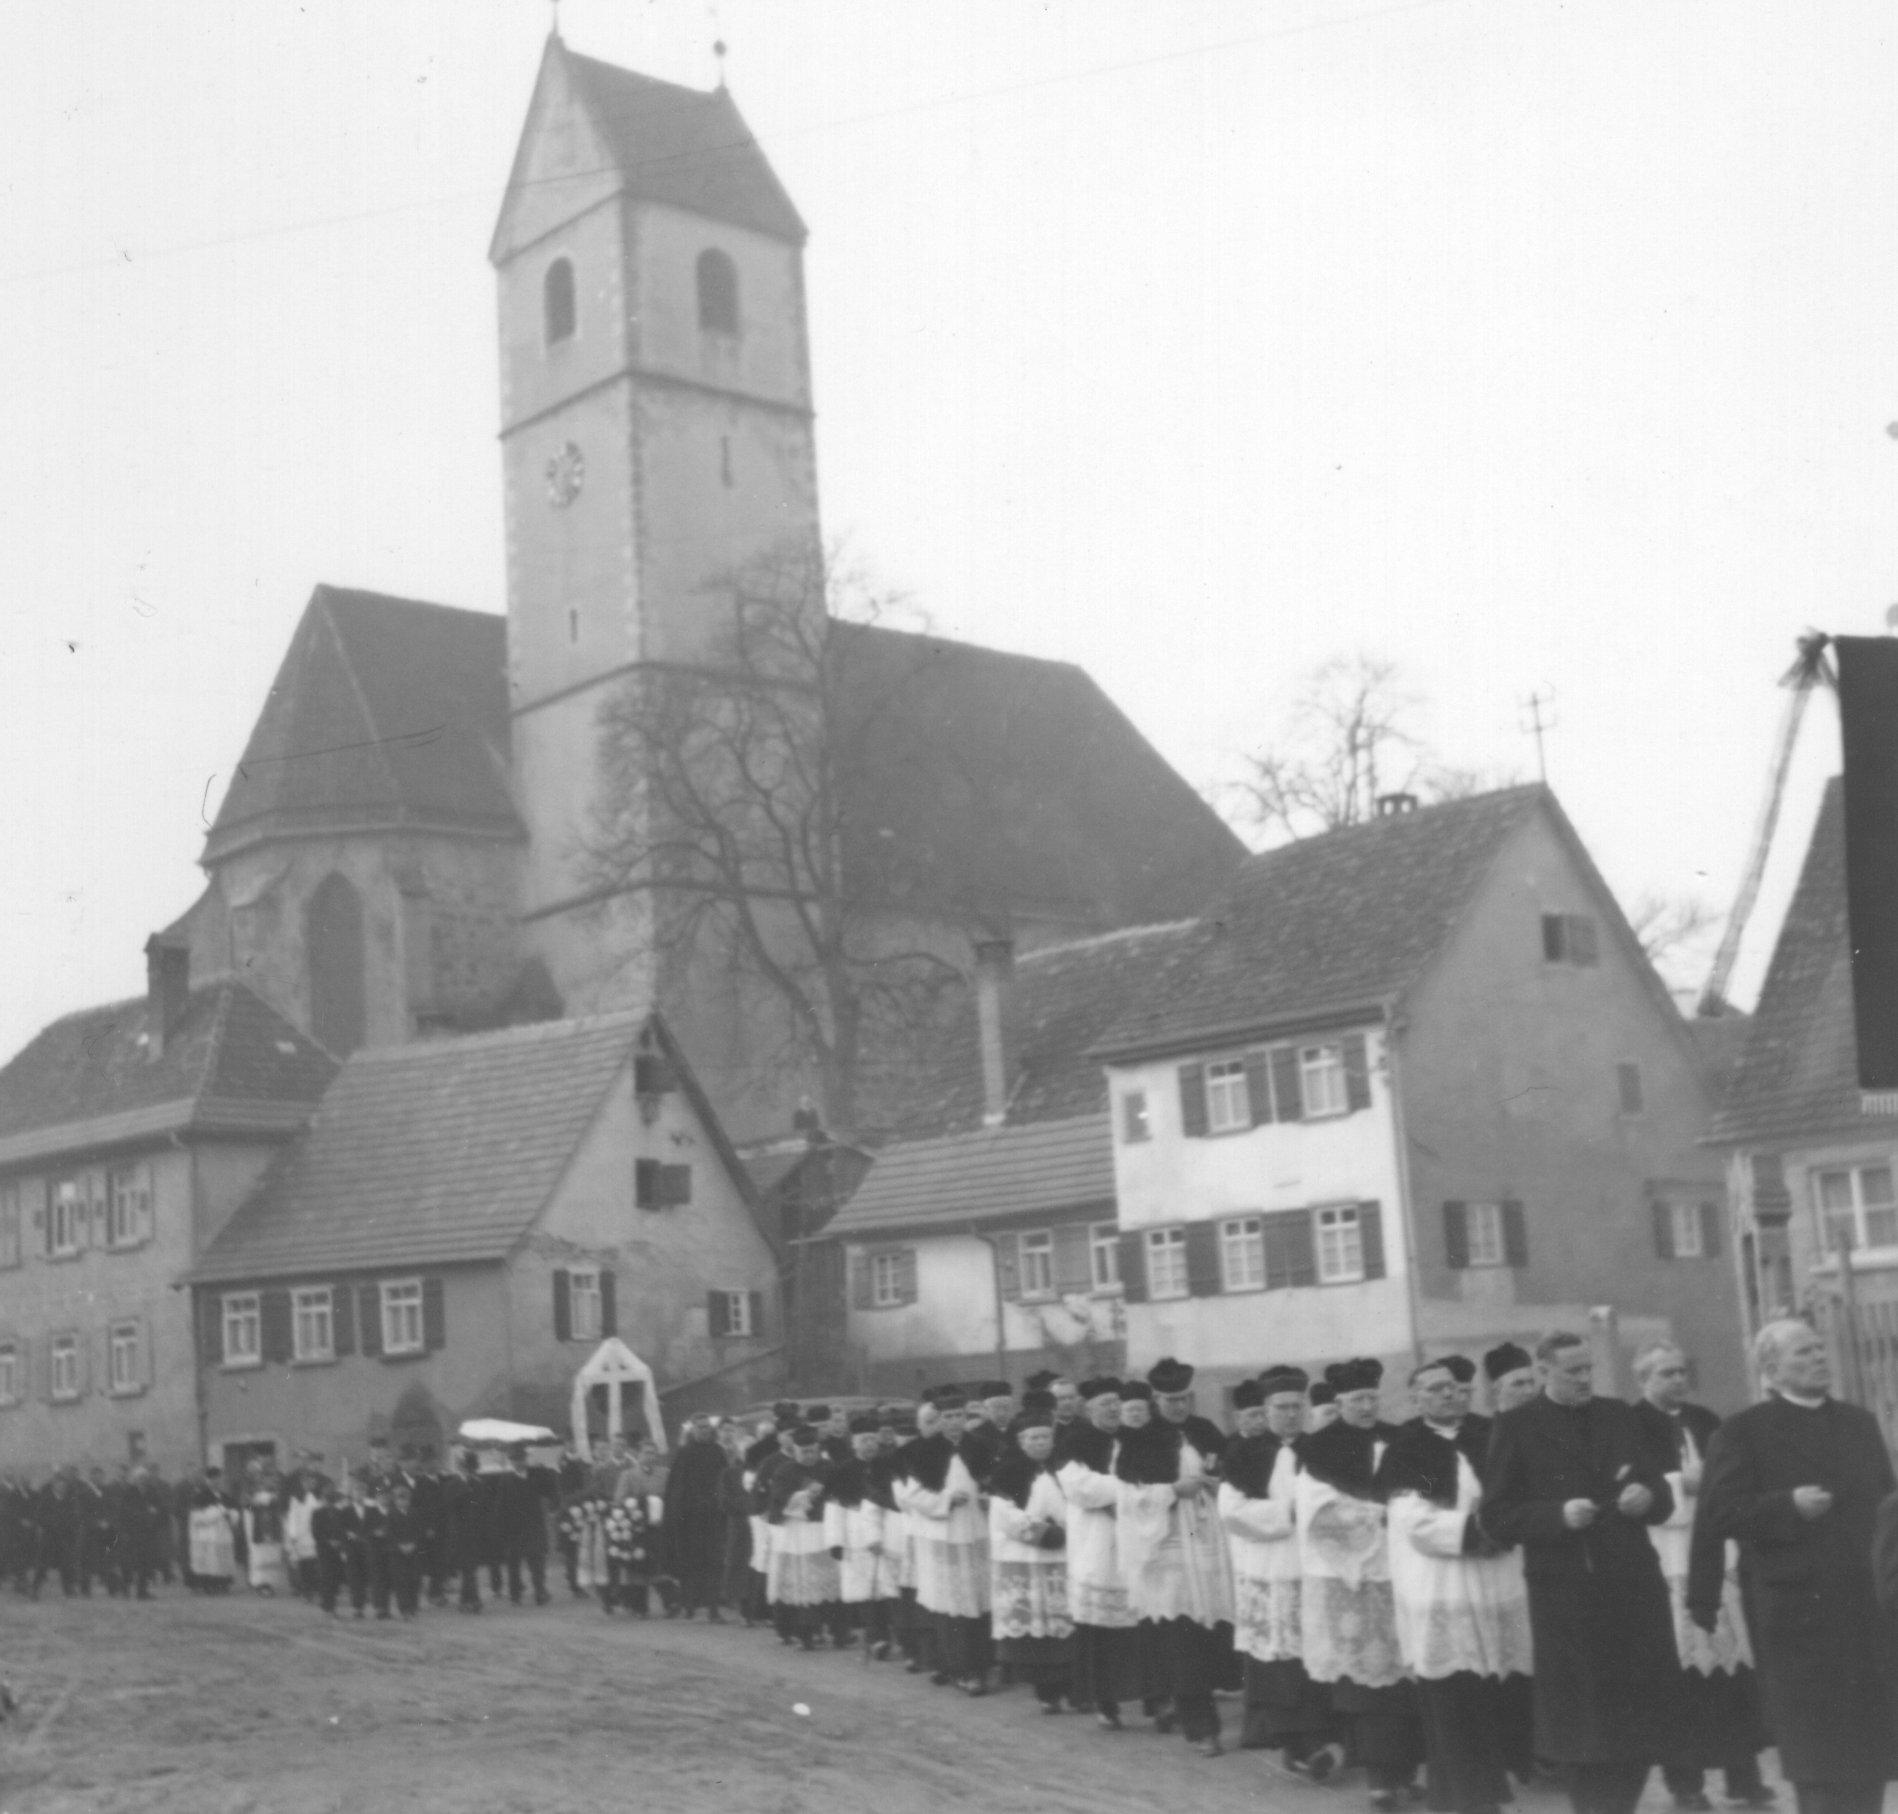 Beerdigungszug